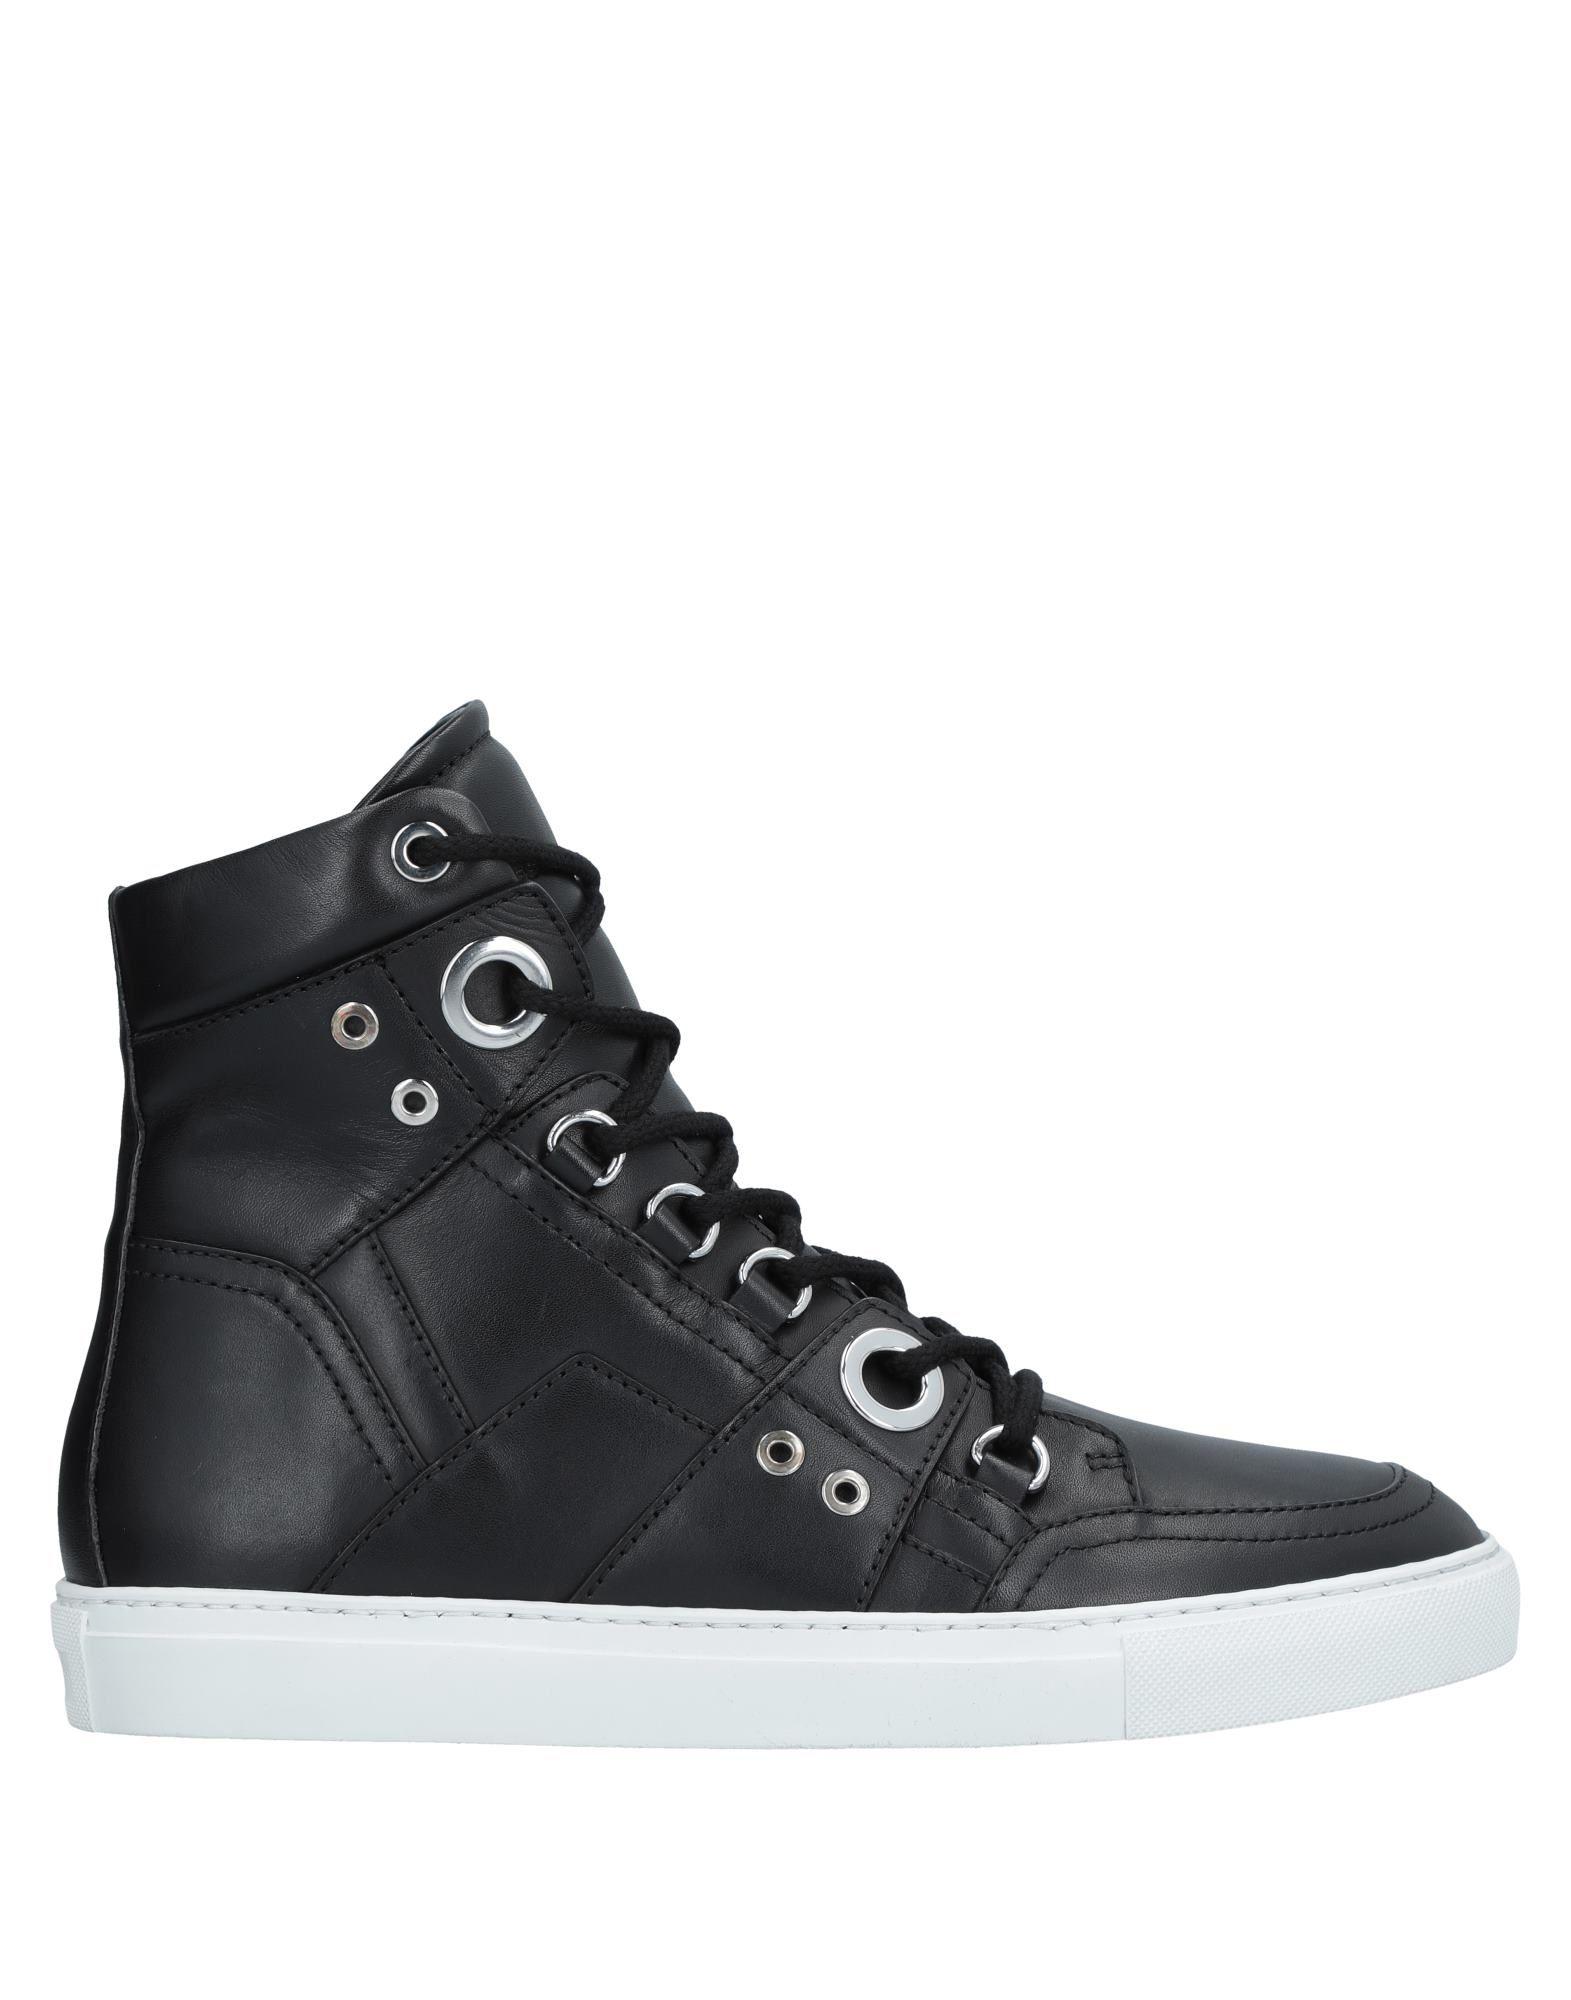 Diesel Black Gold Gute Sneakers Herren  11537008ET Gute Gold Qualität beliebte Schuhe eda931